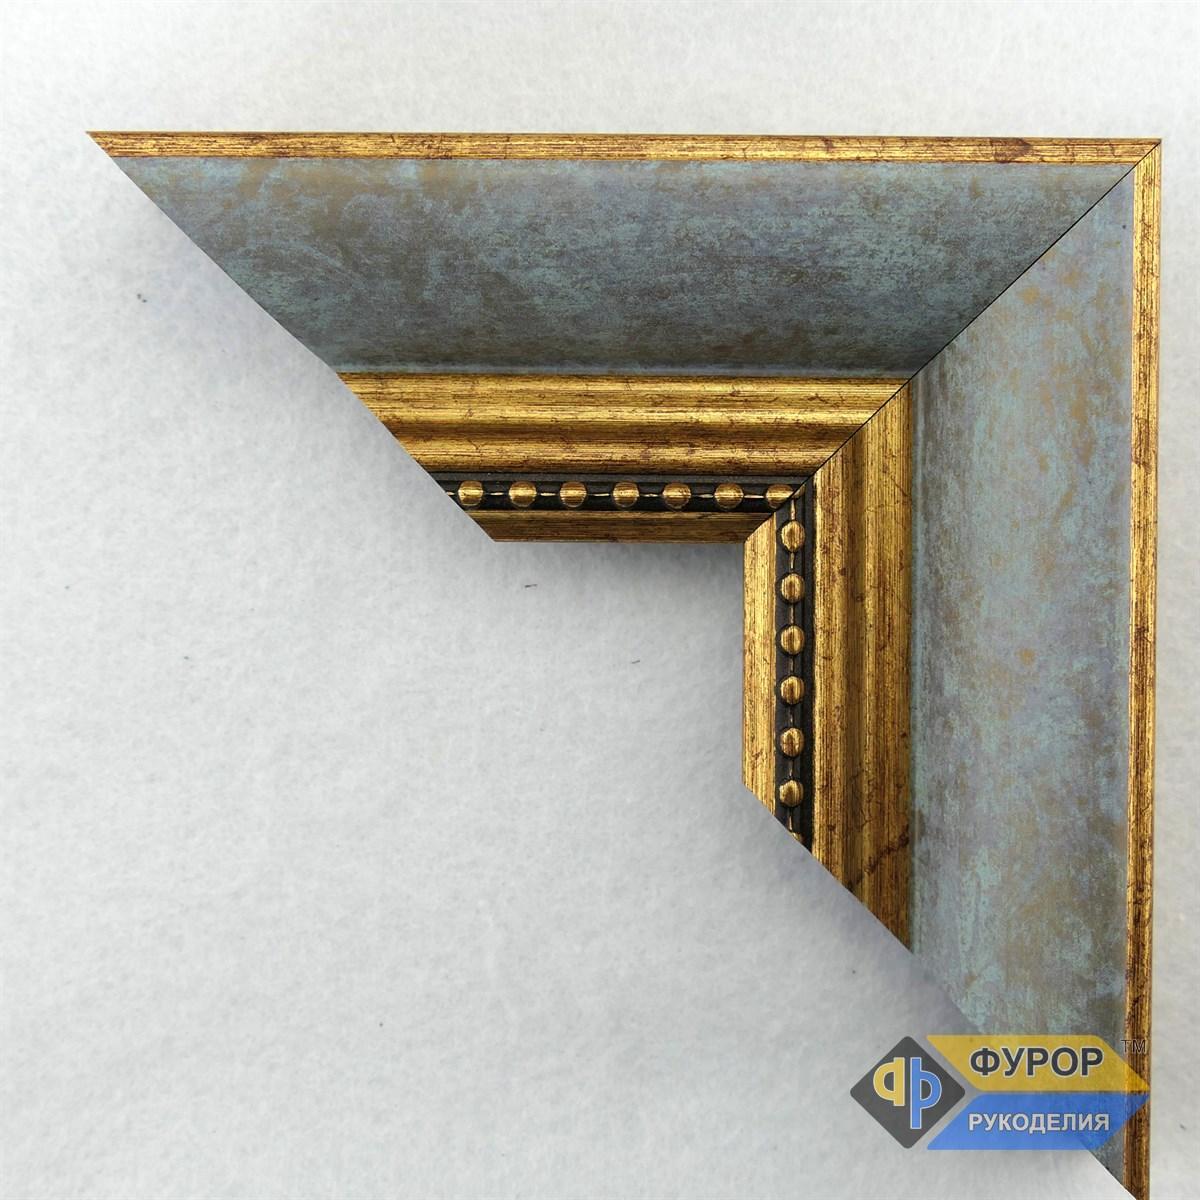 Рамка на заказ для картины, иконы, фото, вышивки, зеркала серая (ФРЗ-5081)